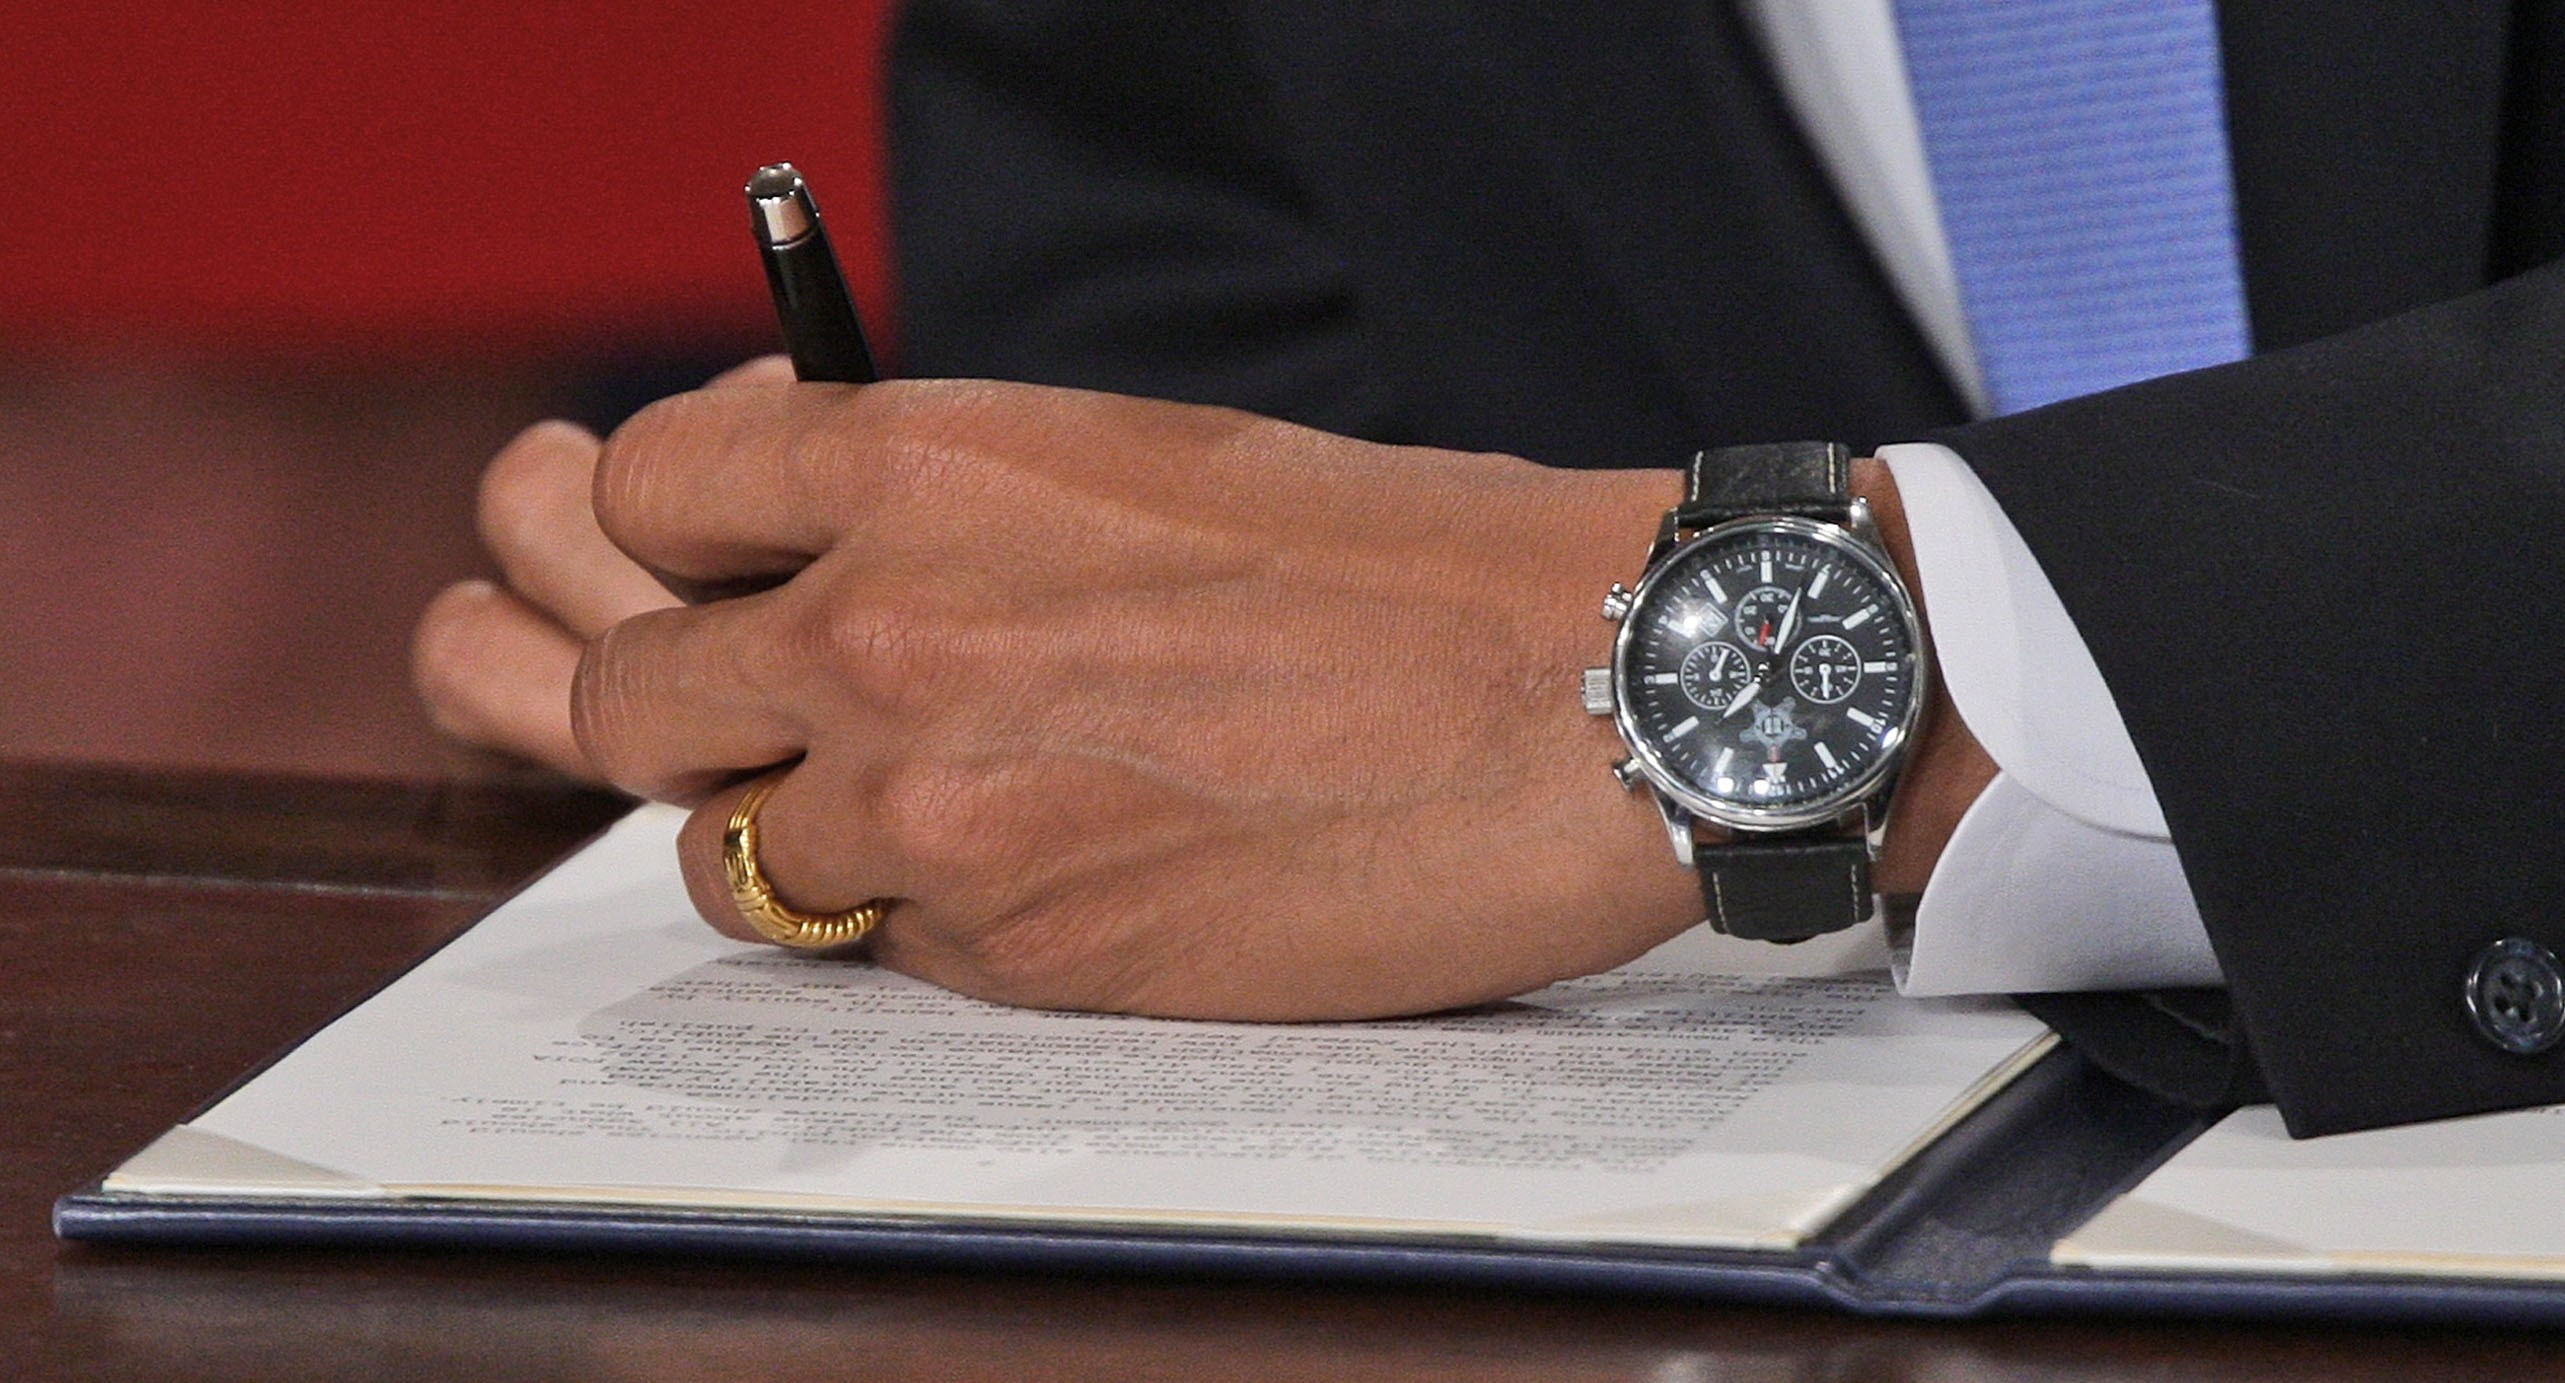 Watching Obama's Watch | OnTheDash